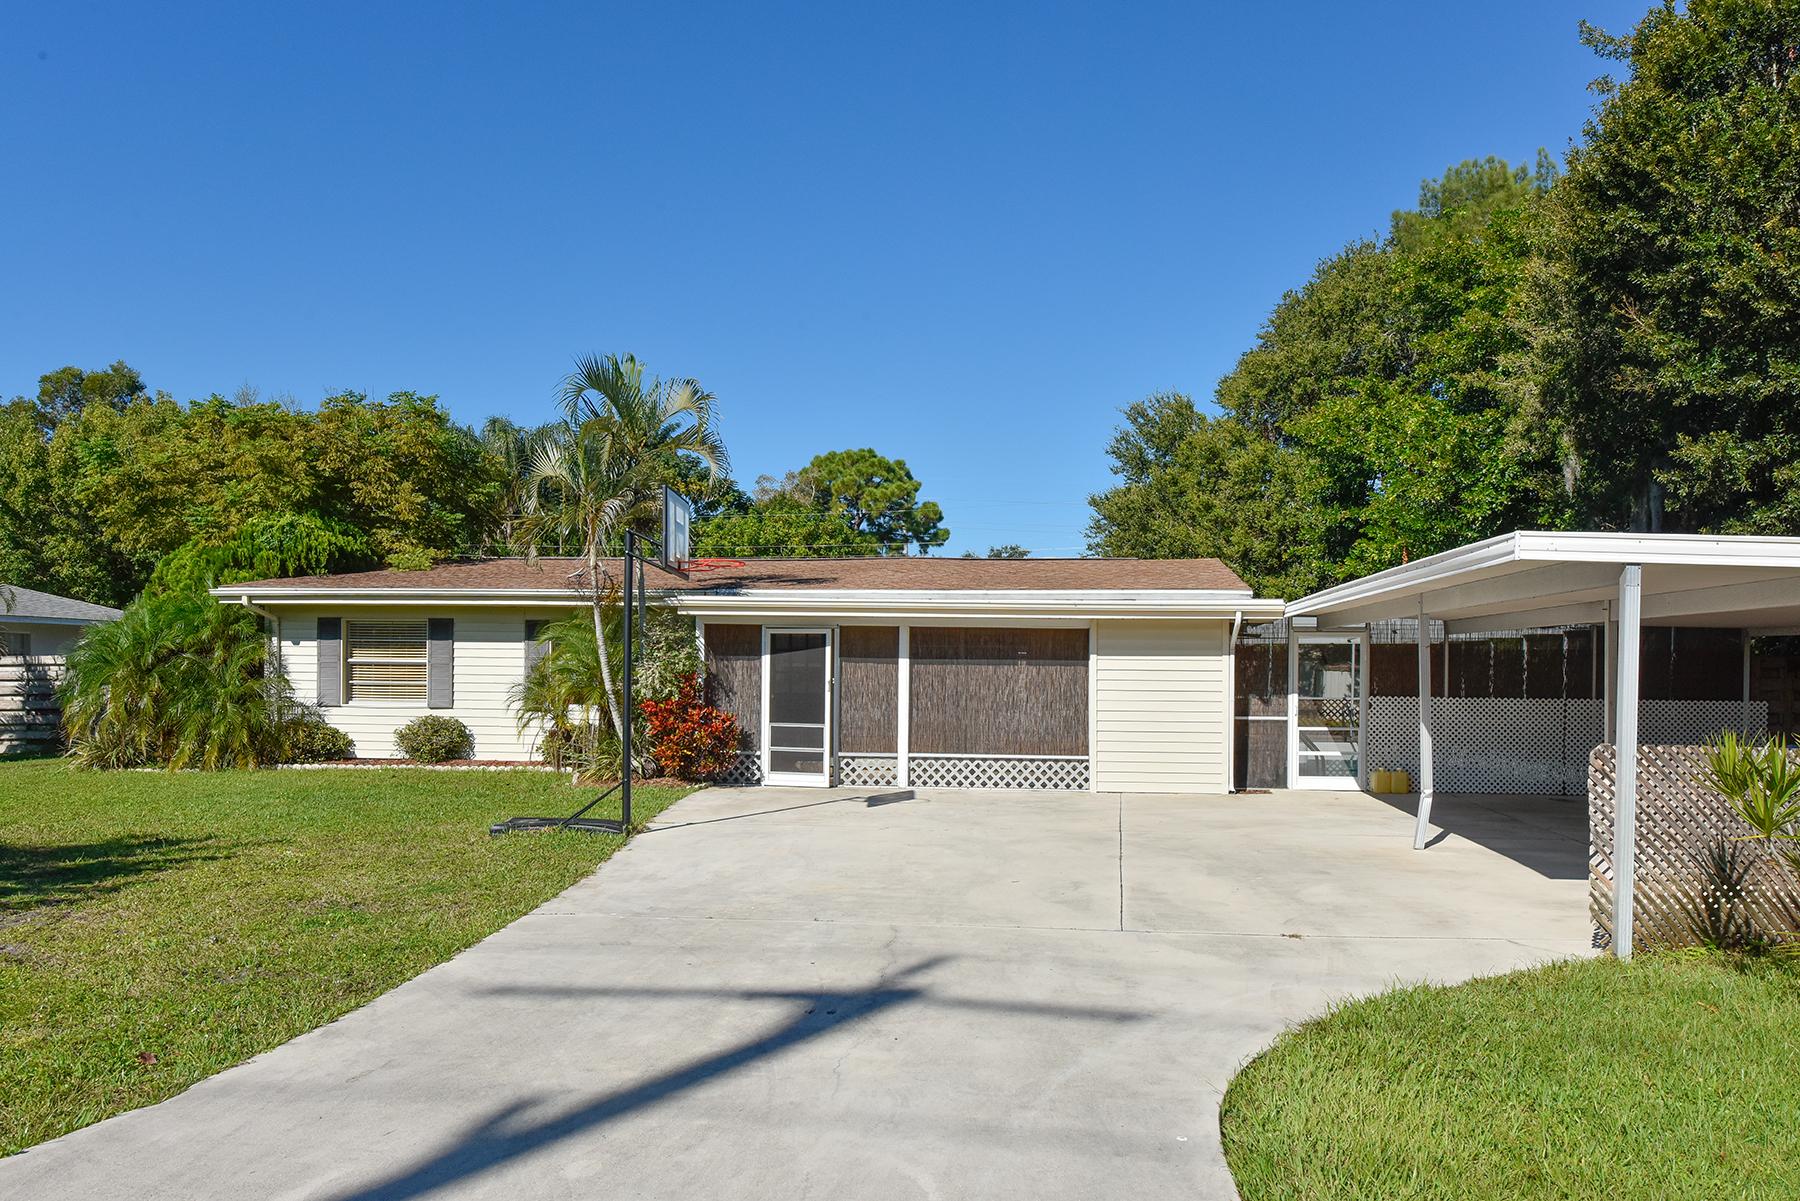 Casa Unifamiliar por un Venta en CLARK LAKES 5948 Mirror Lake Rd Sarasota, Florida, 34238 Estados Unidos